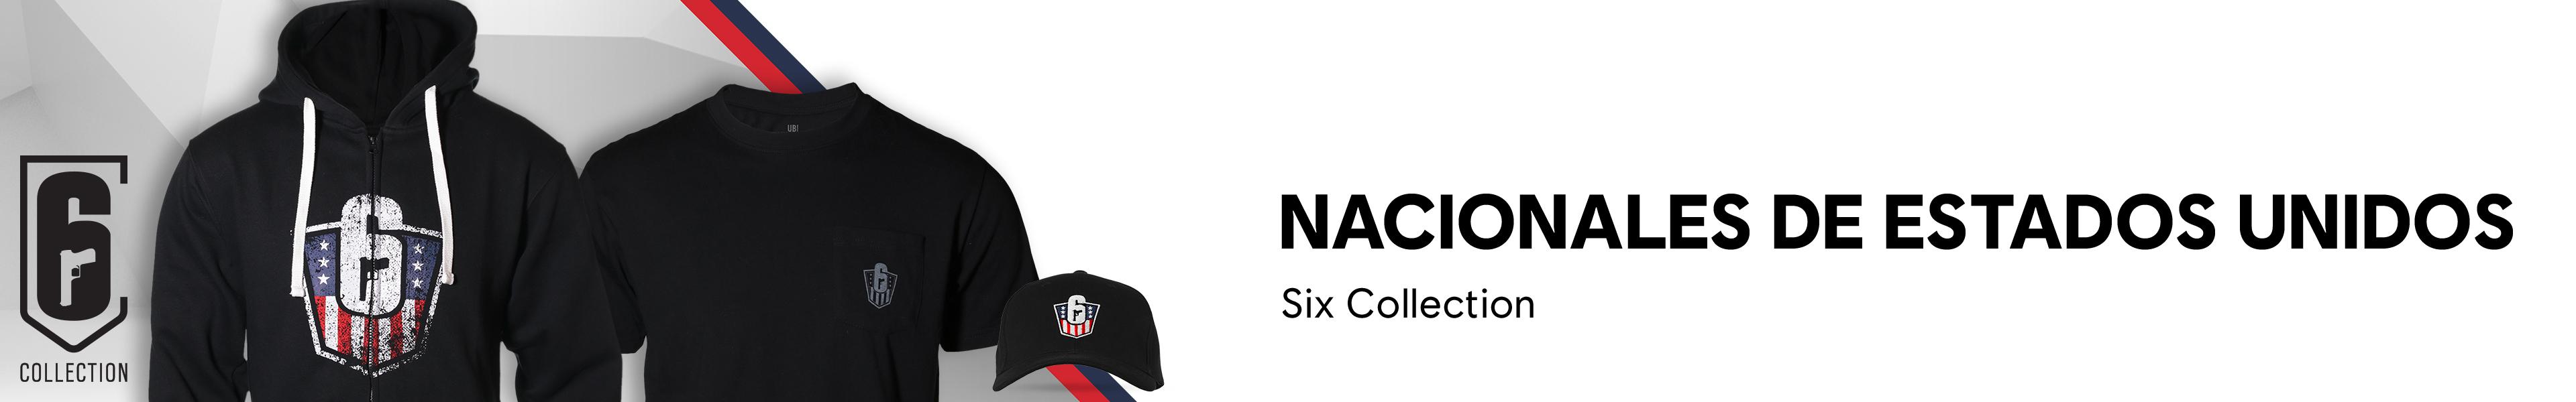 US Nationals Banner Espanol